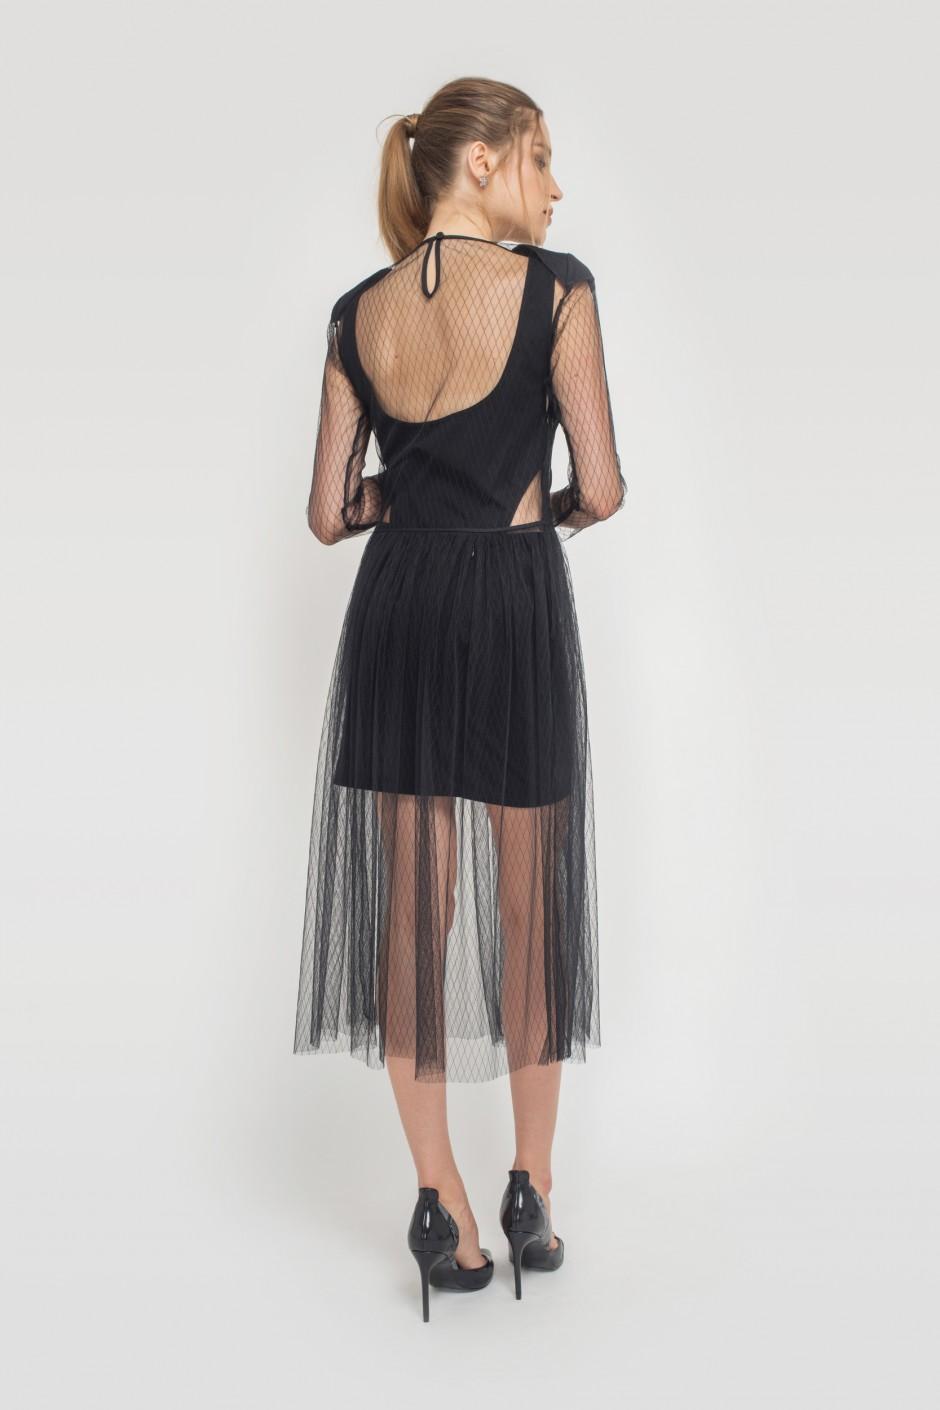 Edgy Netting Dress